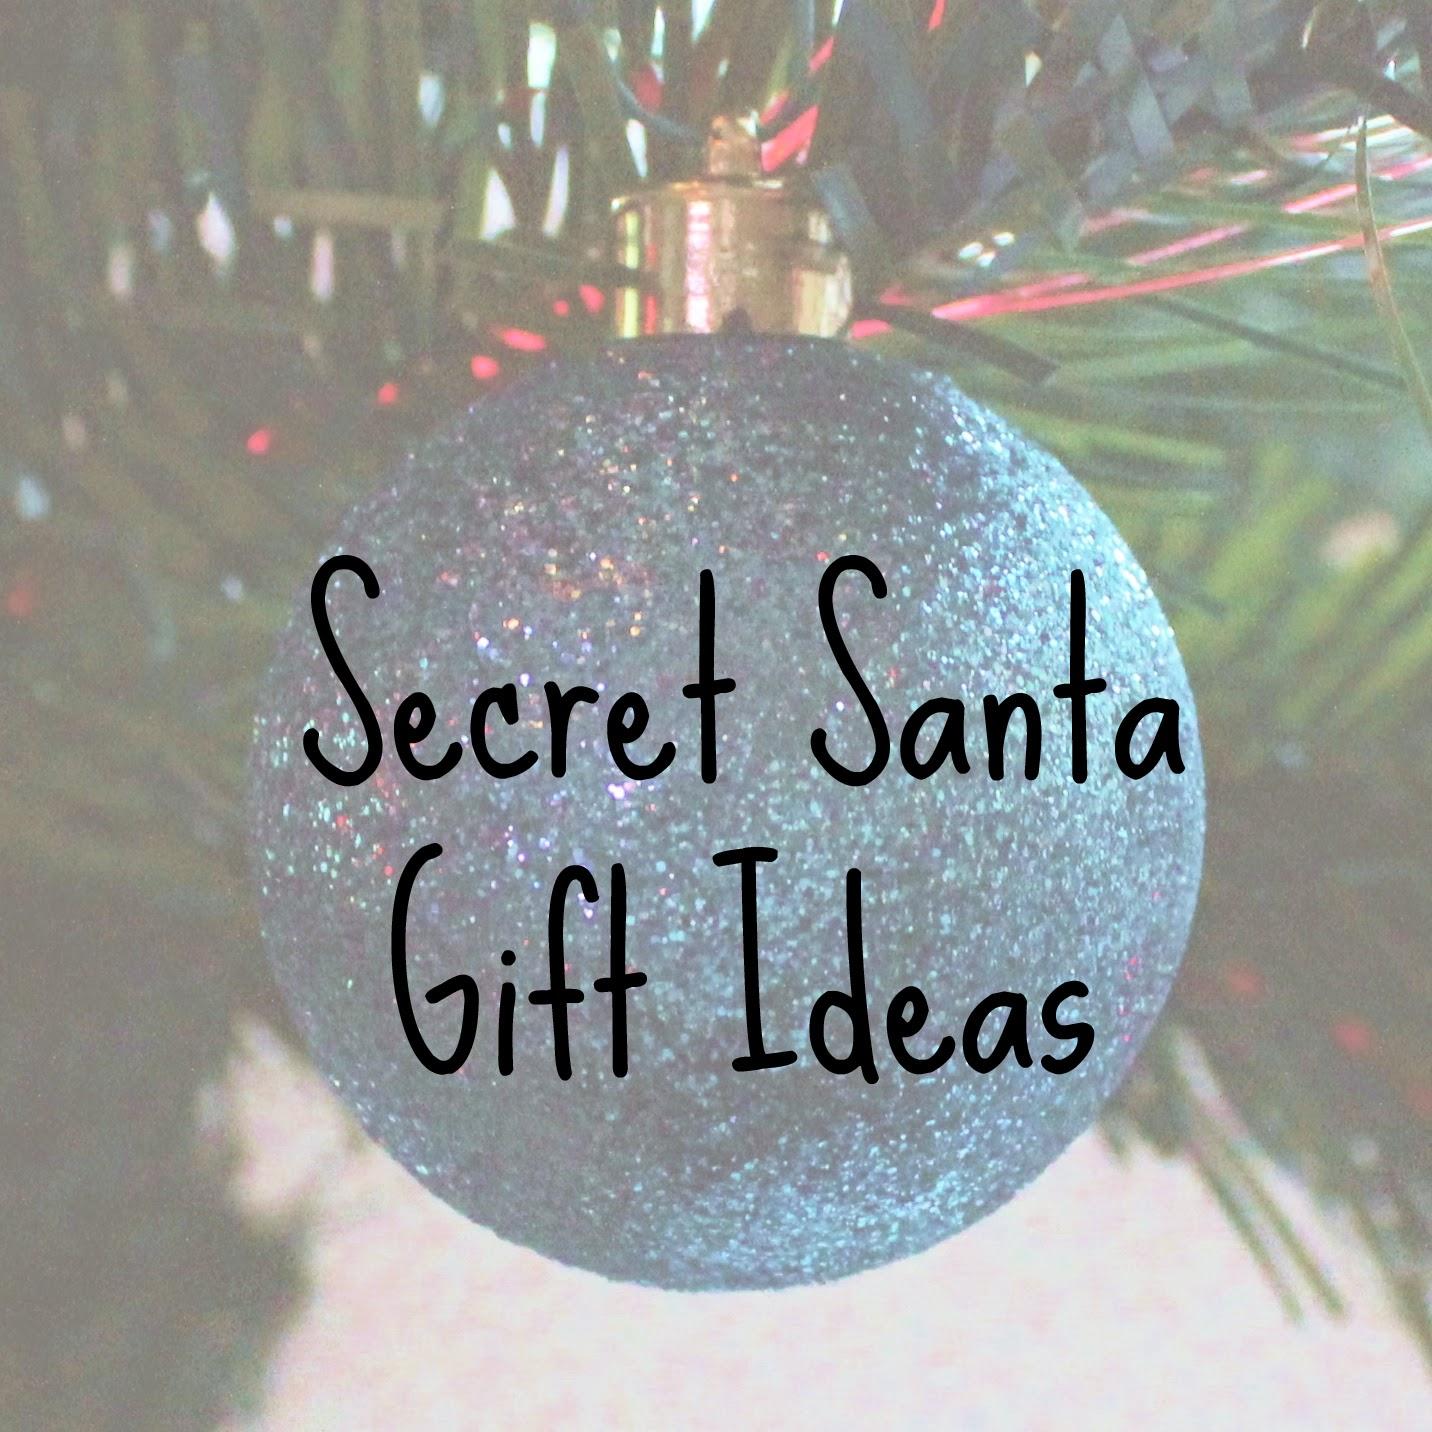 Secret Santa Gift Ideas 2014 | The Inelegant Wench